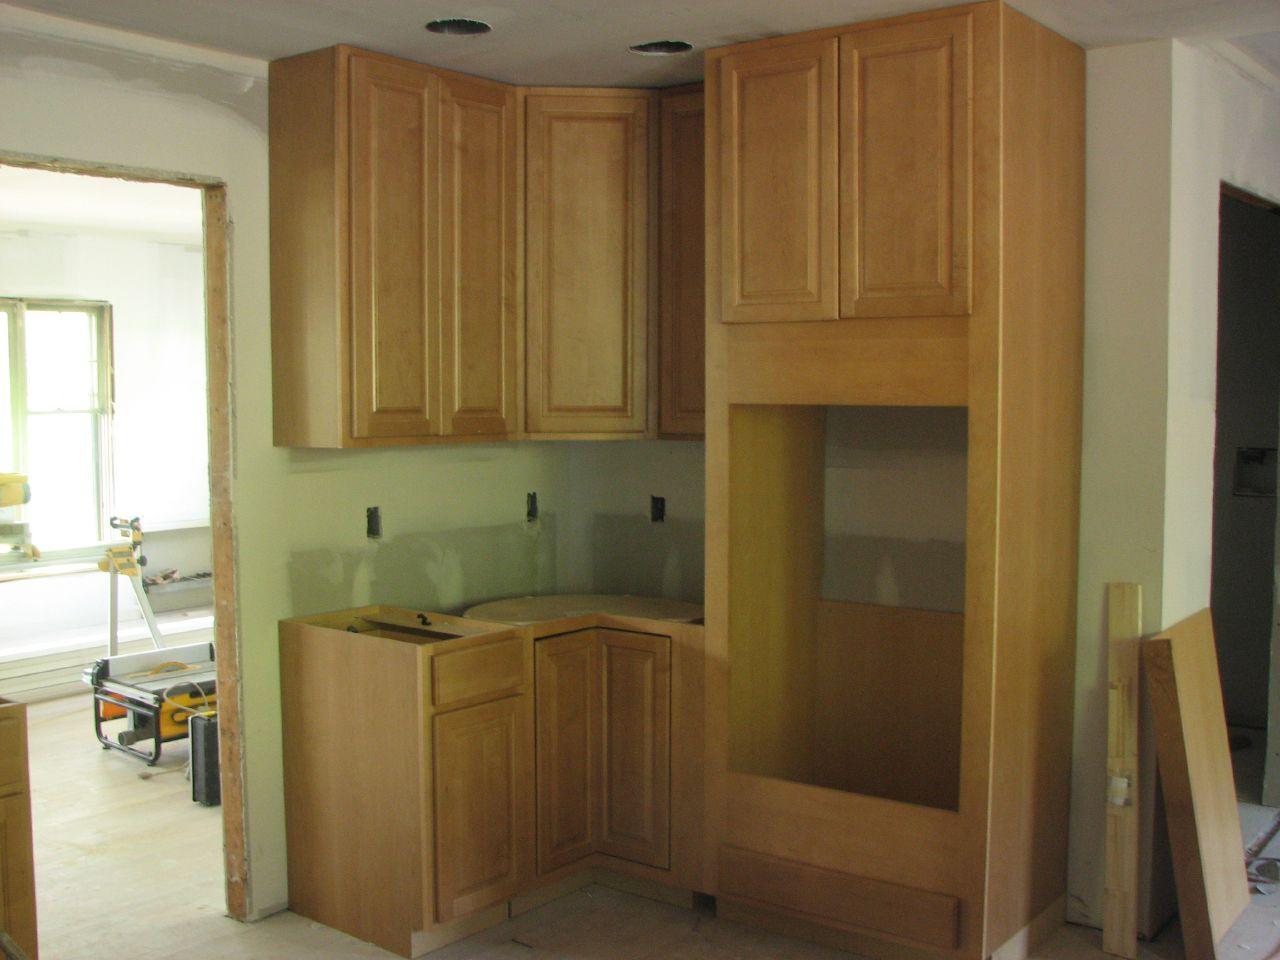 oven, base cabinet